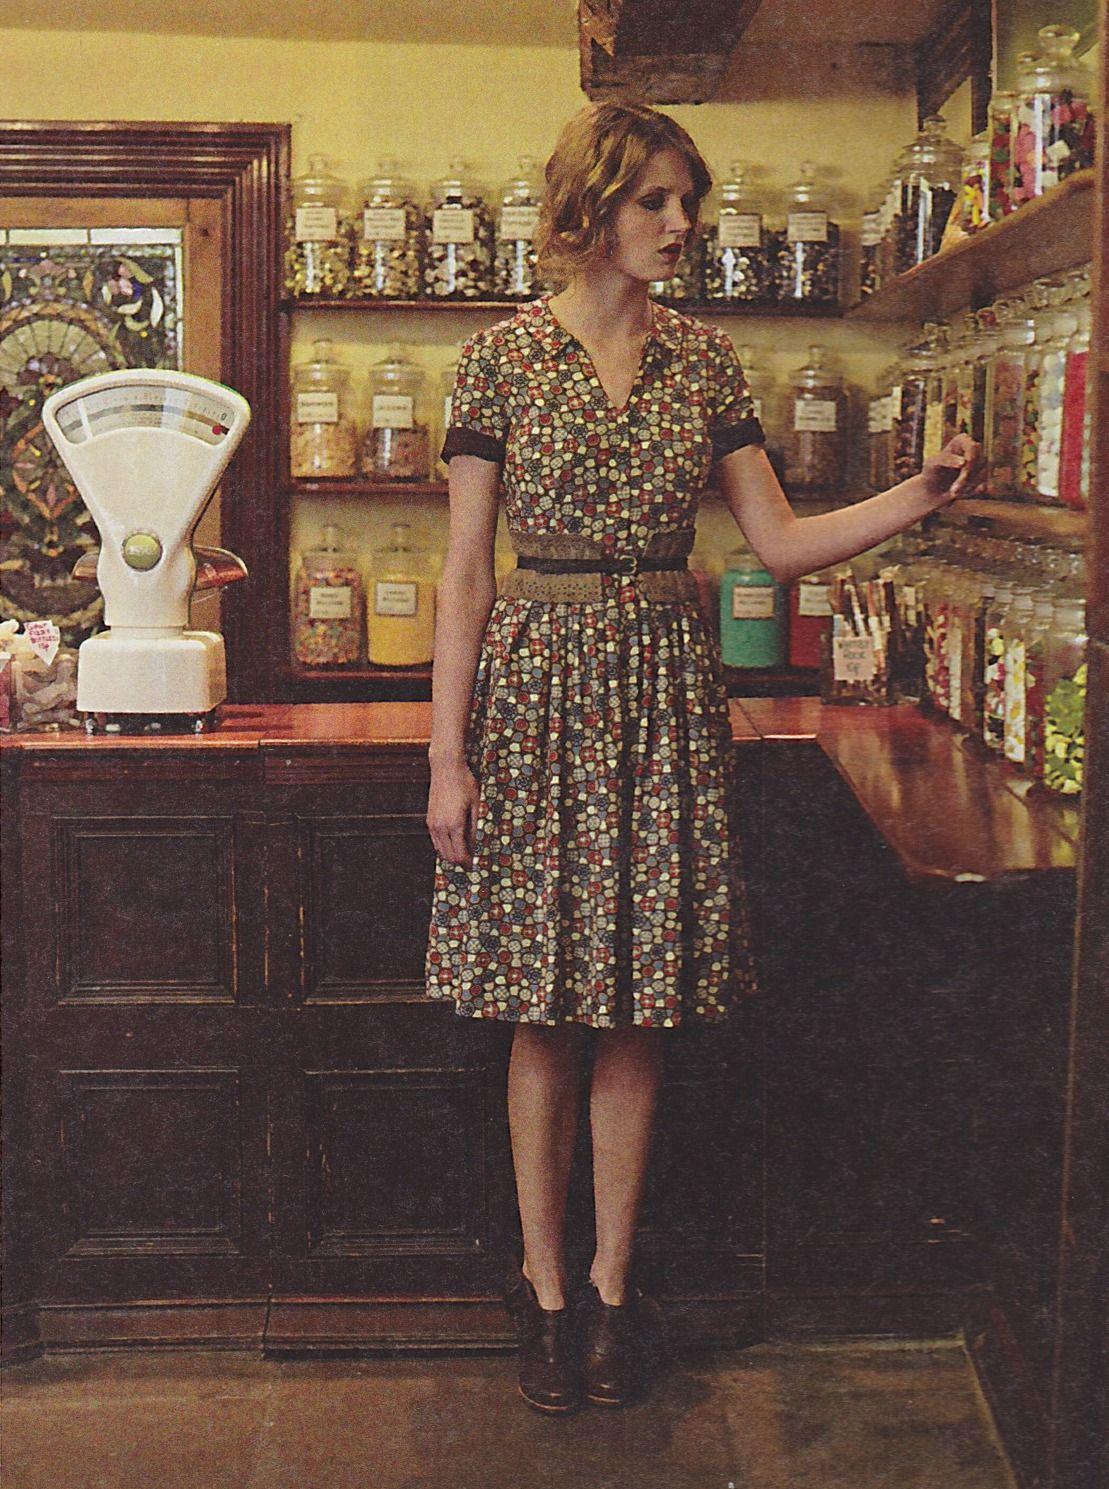 shirtwaist dress | via Anthropologie Catalog (August 2010)